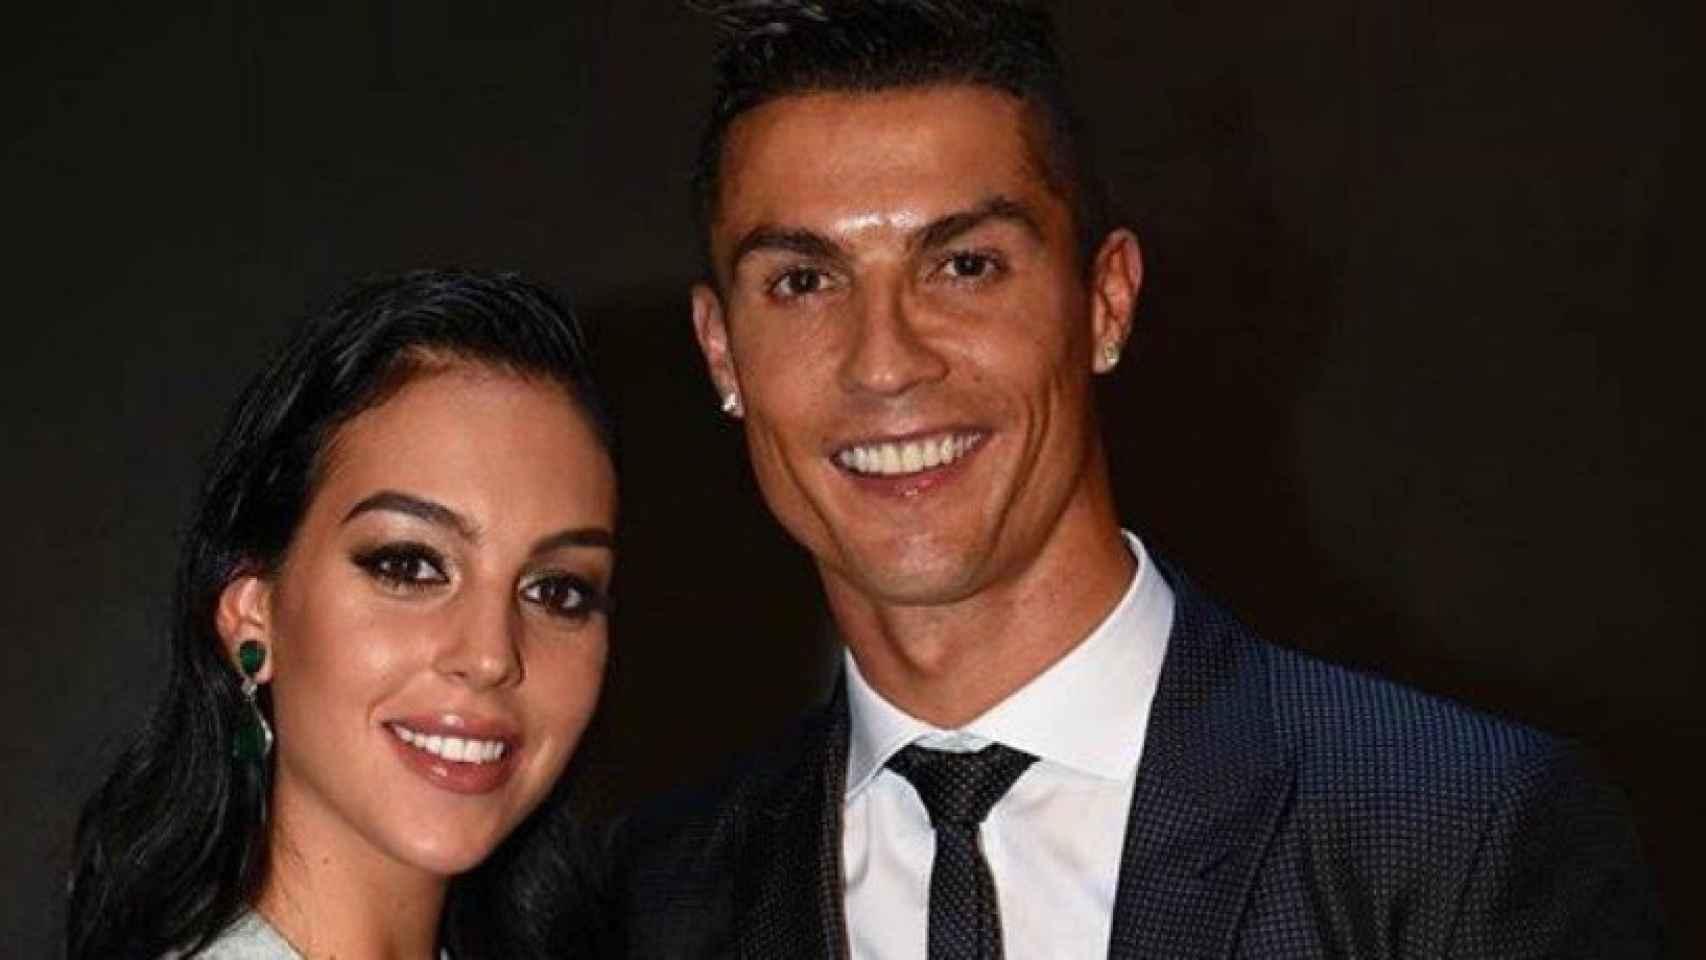 Cristiano y Georgina, en los The Best. Foto: Twitter (@Cristiano)